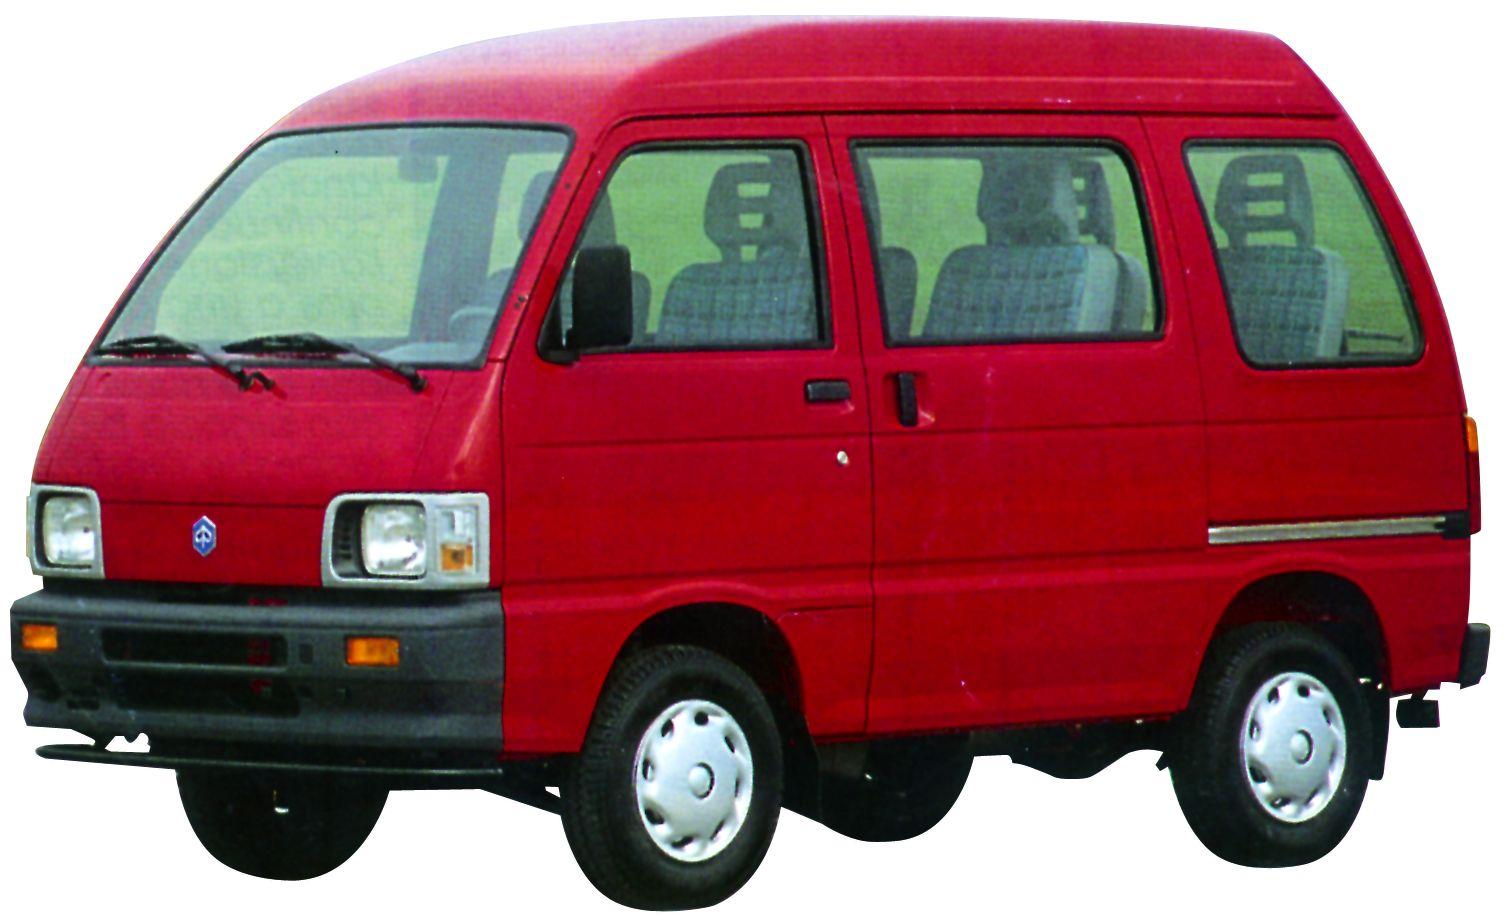 Piaggio Porter 1992 - now Microvan #1